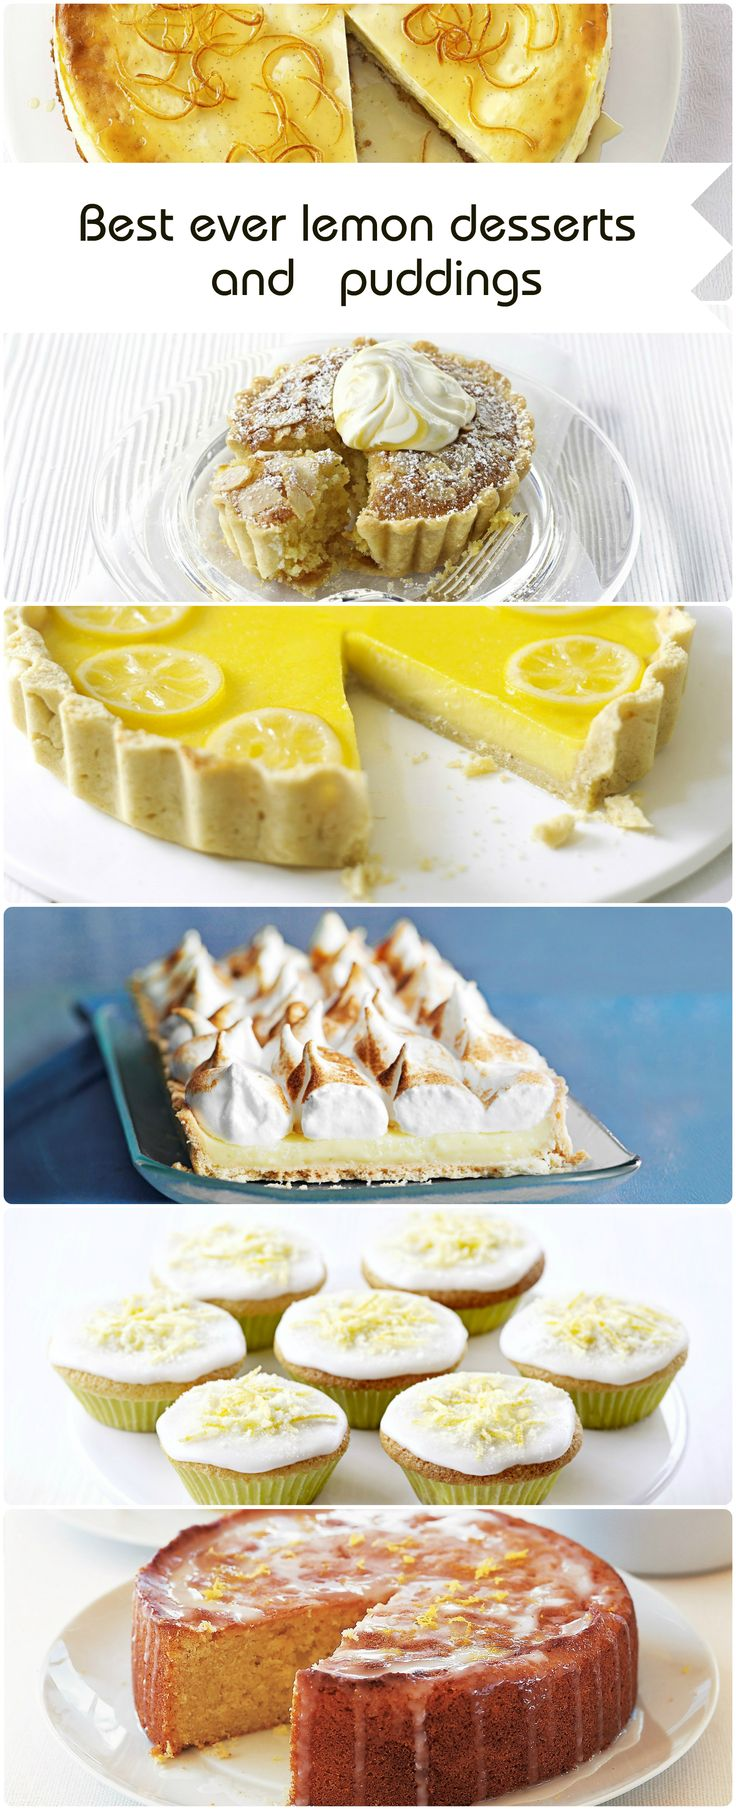 Lemon Polenta Cake With Limoncello Syrup